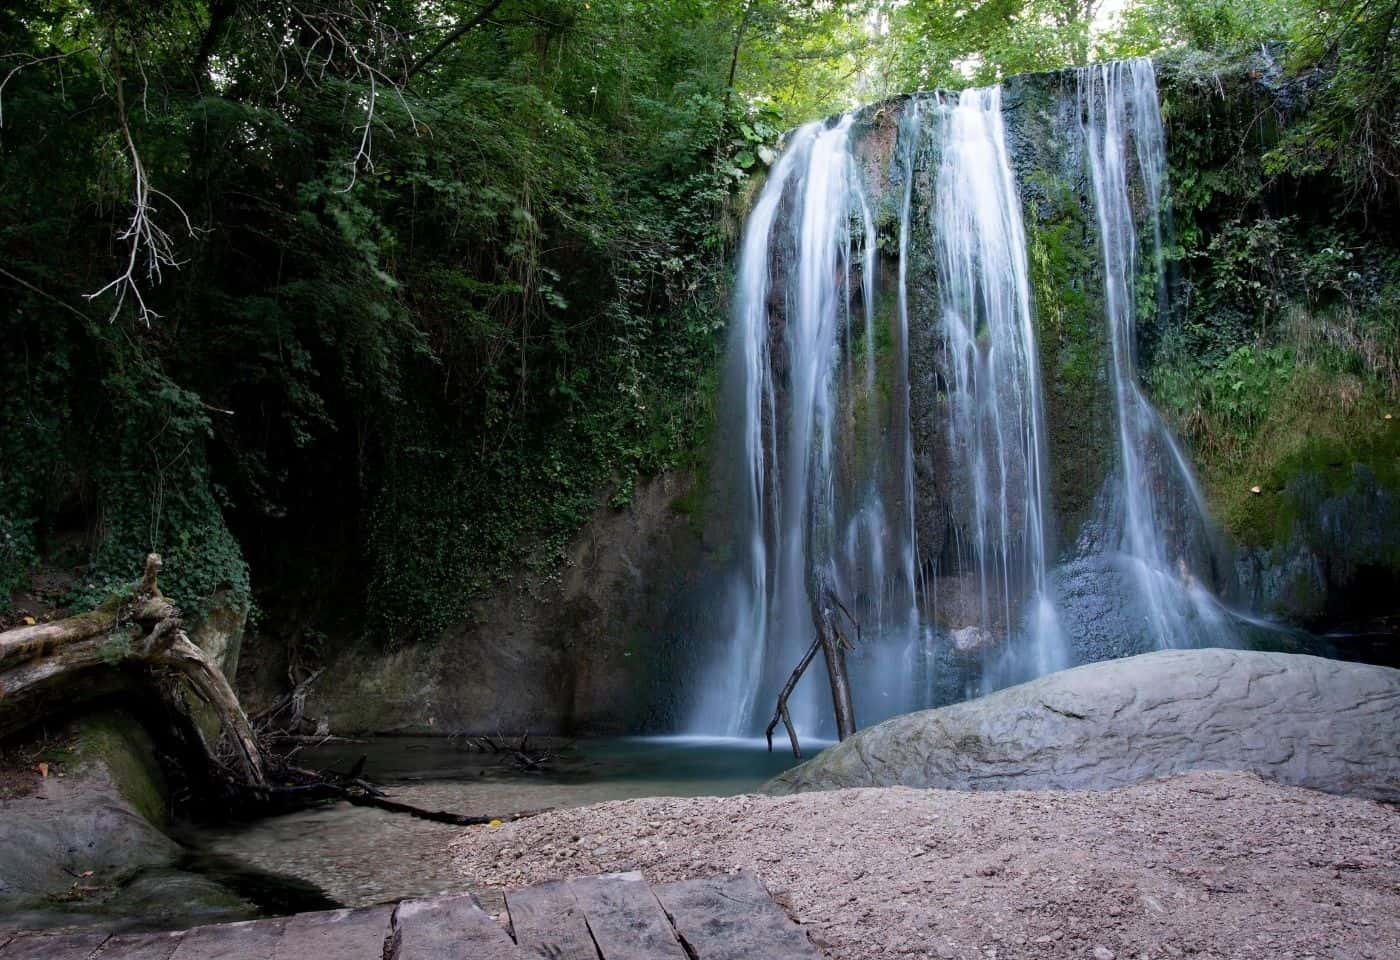 Cascata grande de Lu Vagnatò - Via delle Cascate Perdute di Sarnano